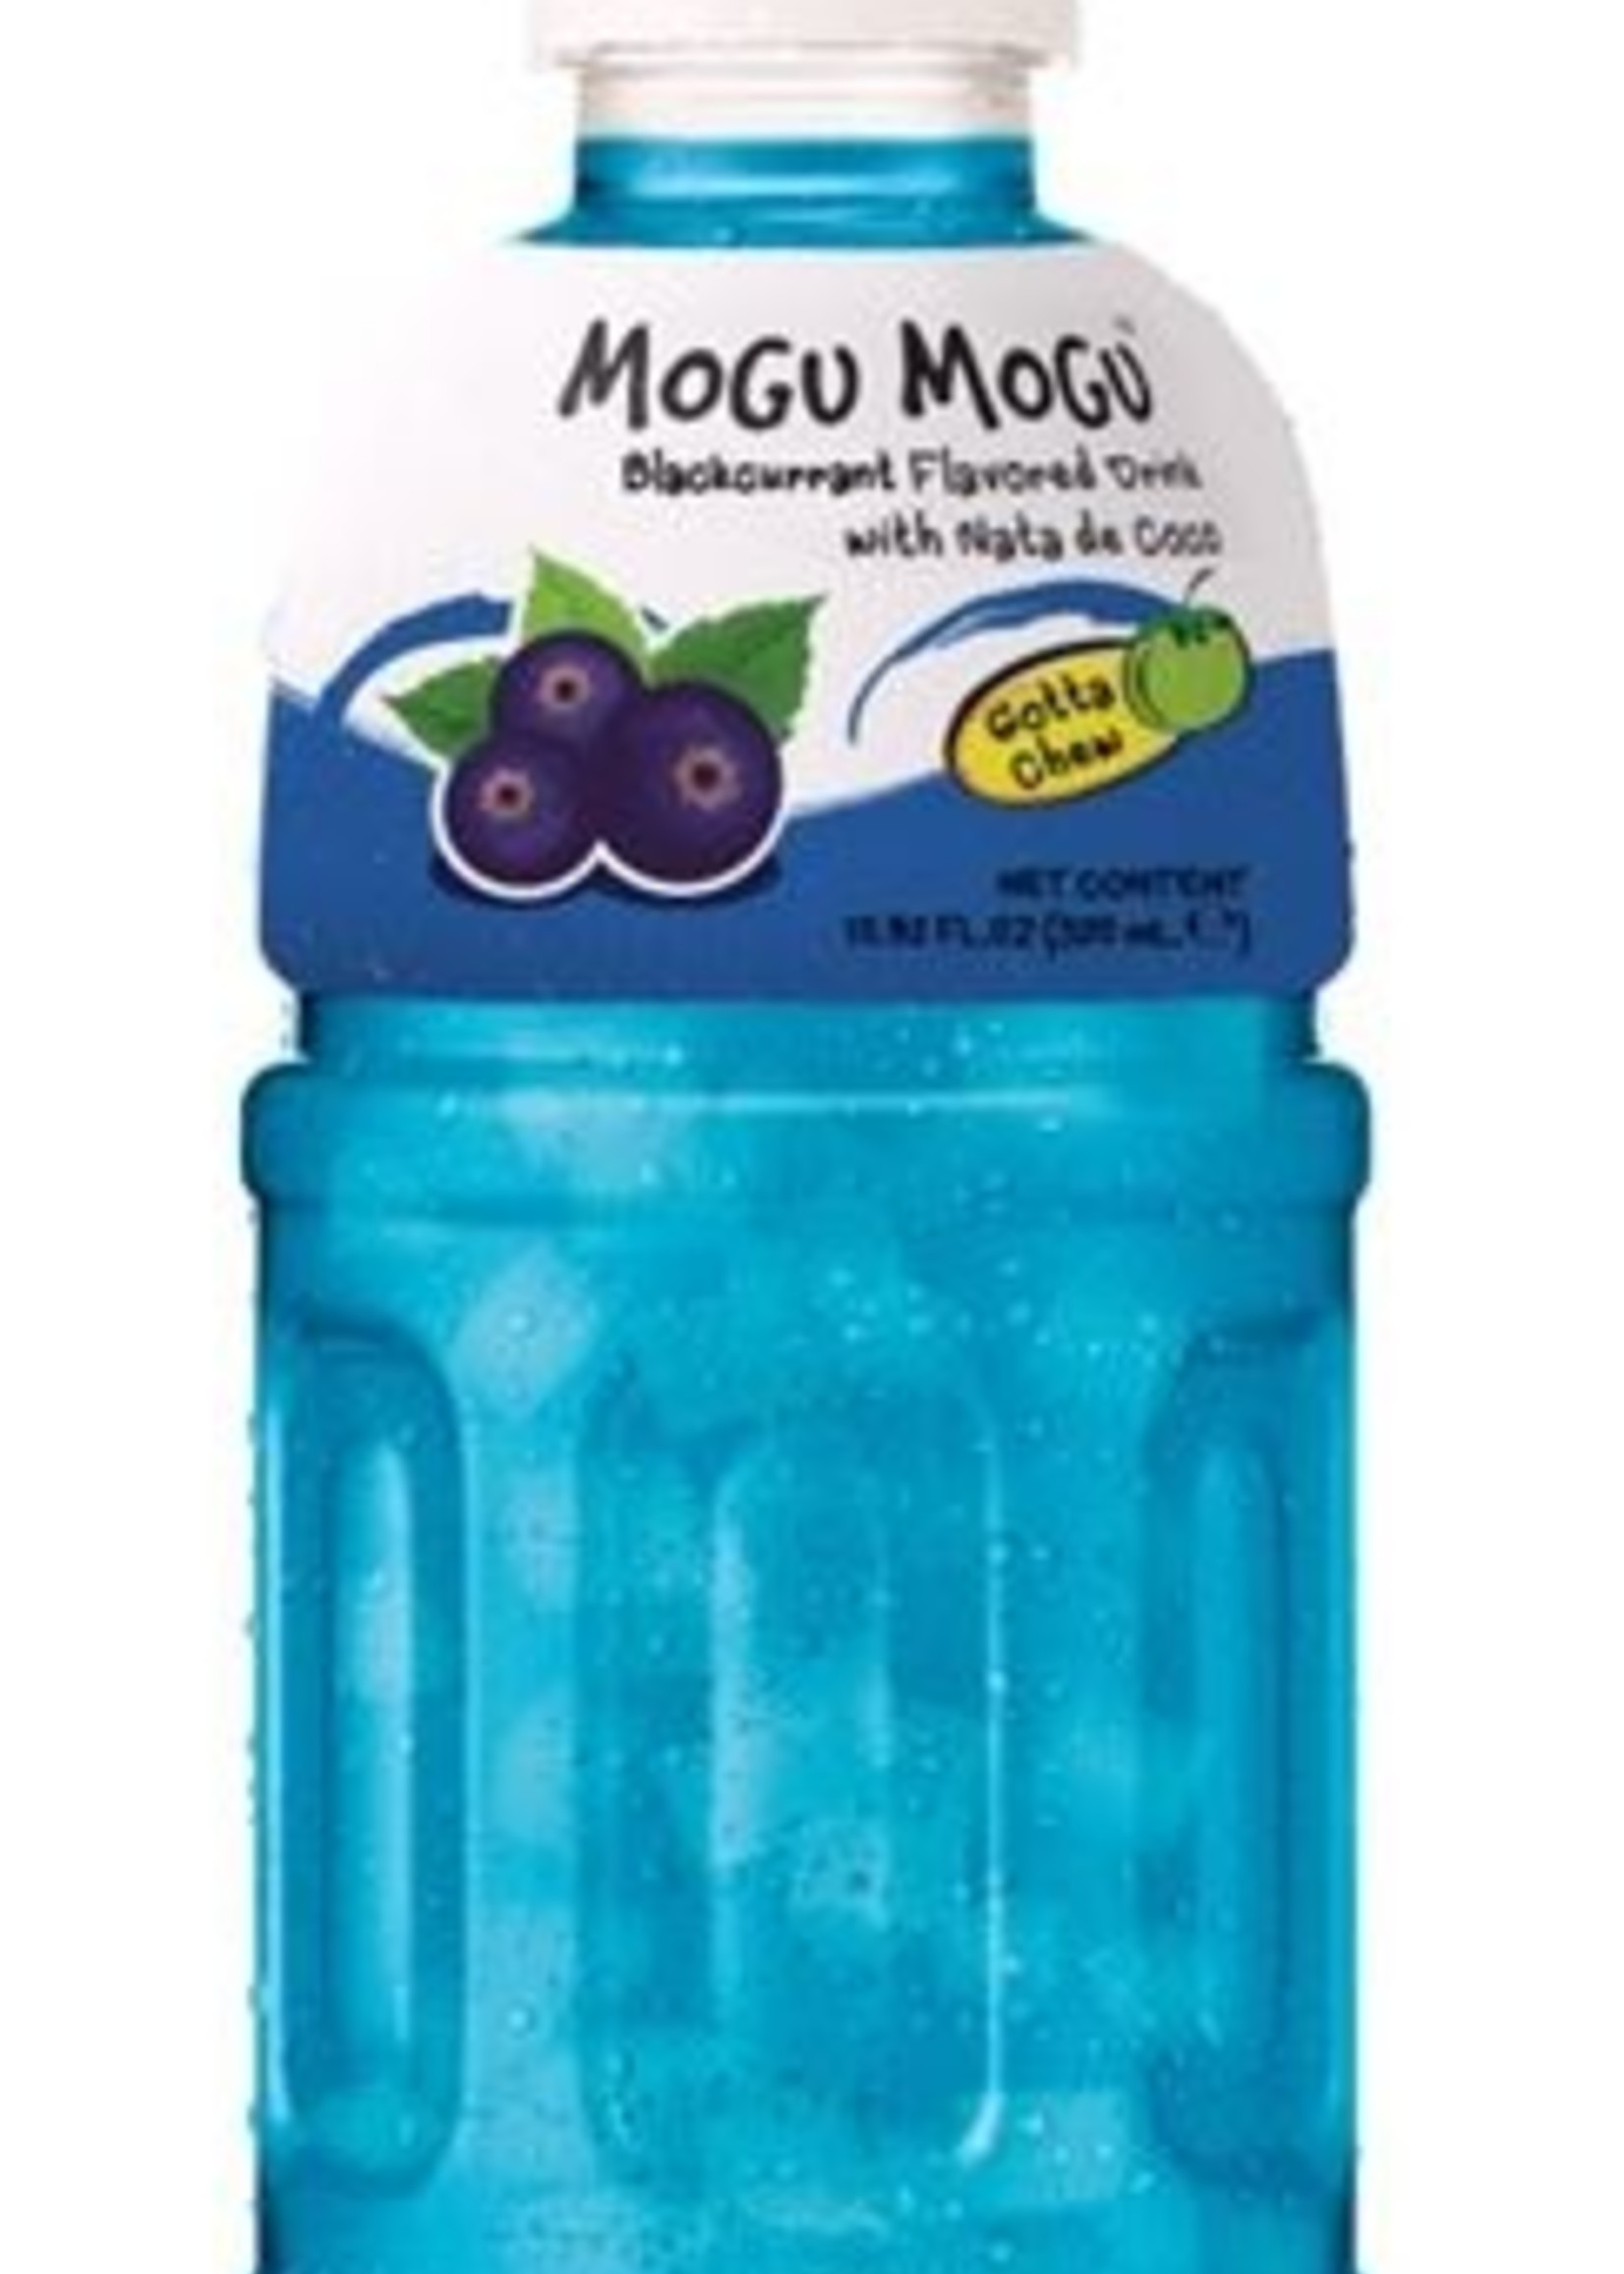 Mogu Mogu Blackcurrent 24 x 320 ml